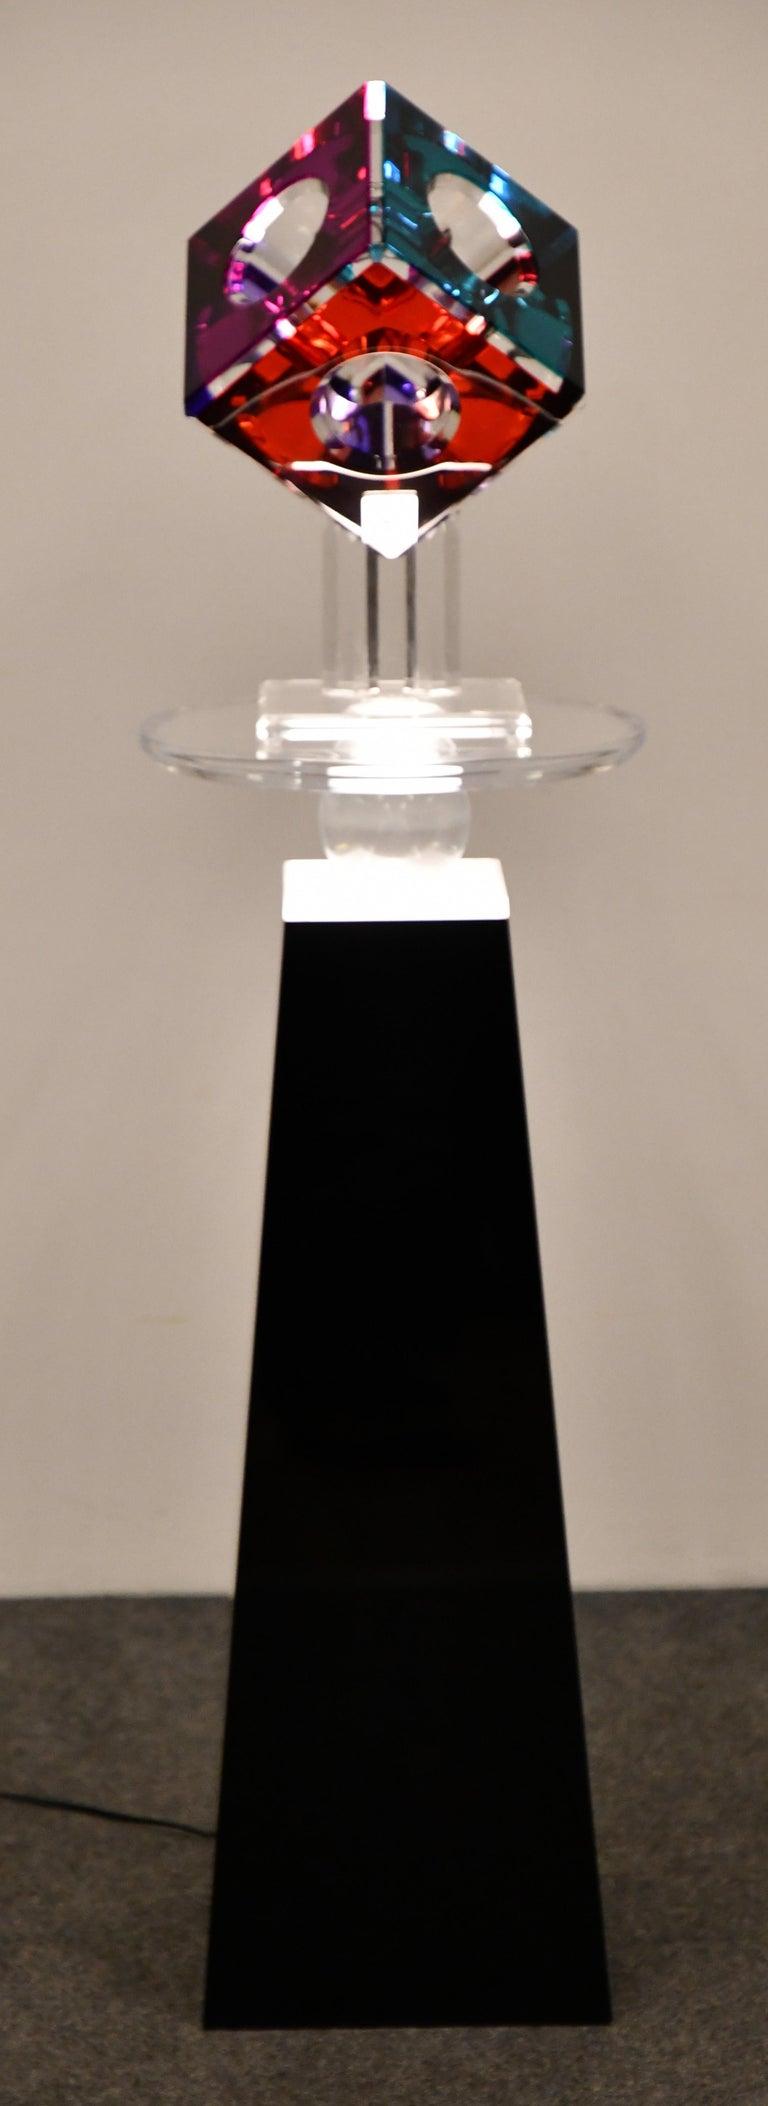 Lucite Sculpture by Shlomi Haziza, 2000s 9